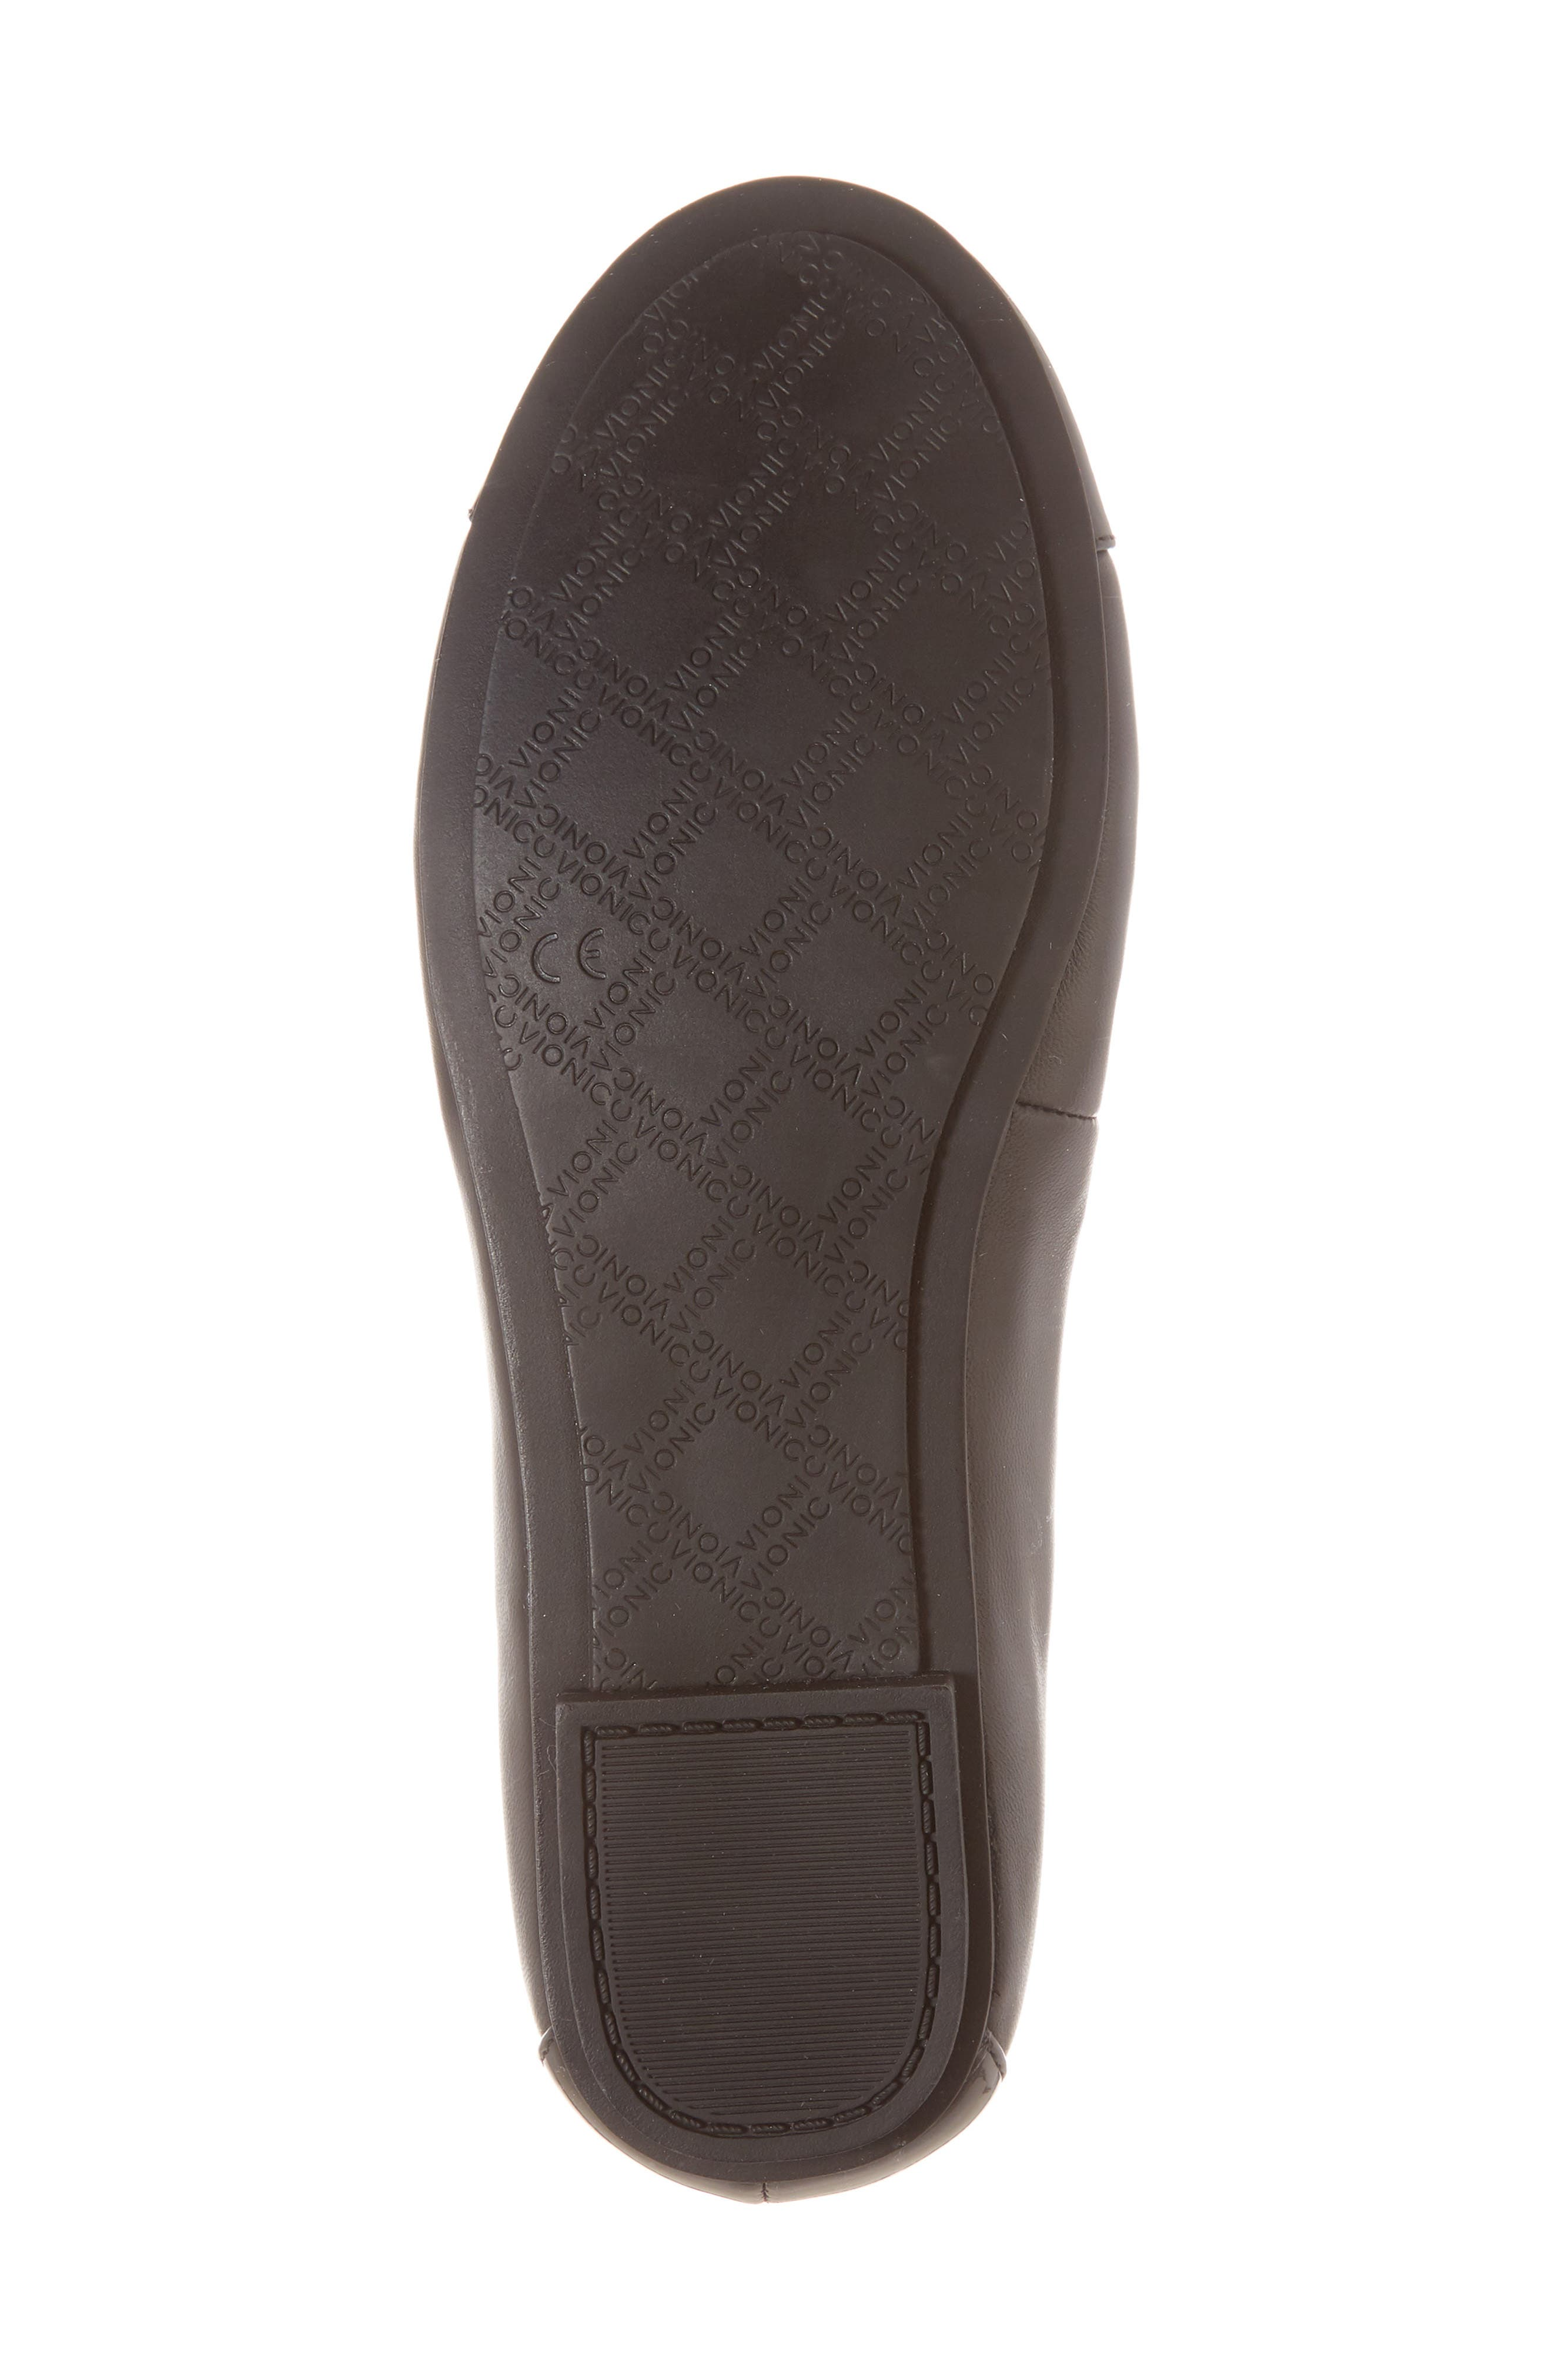 VIONIC, 'Minna' Leather Flat, Alternate thumbnail 6, color, 002